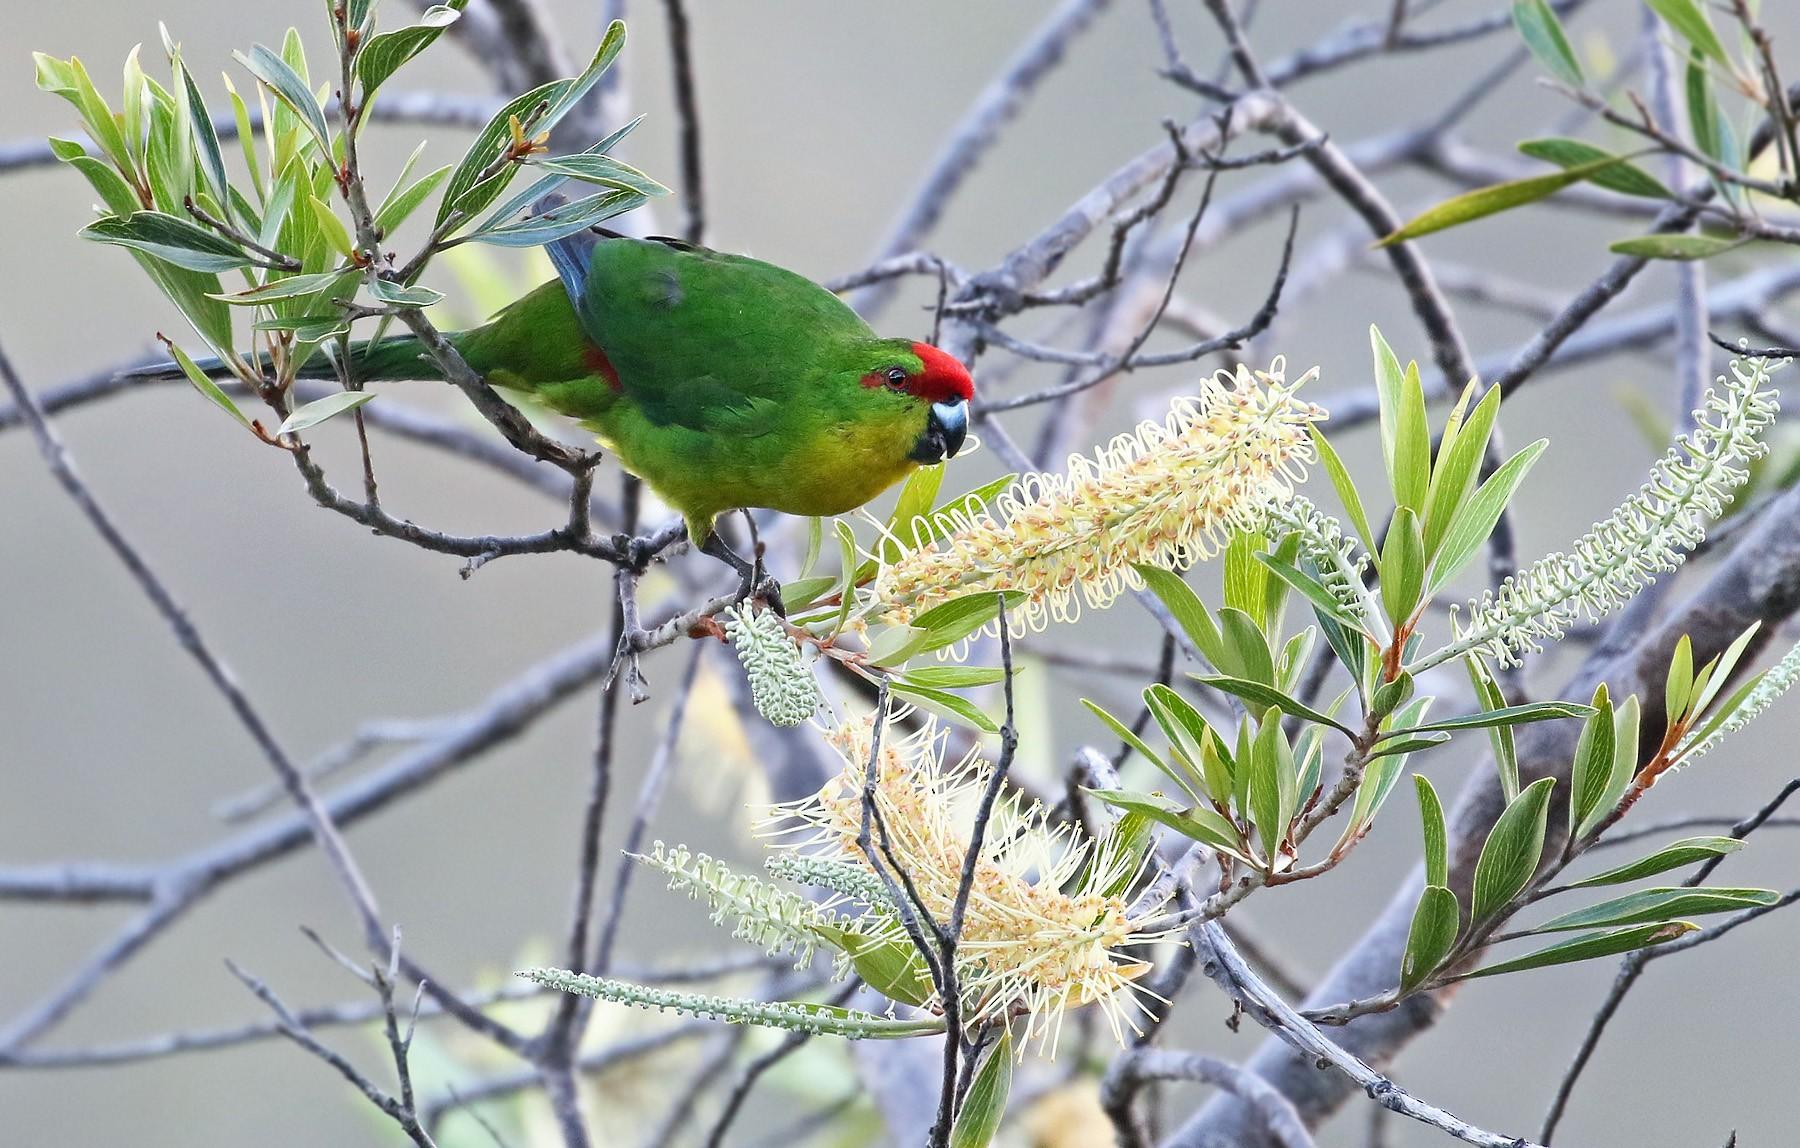 New Caledonian Parakeet - Andrew Spencer